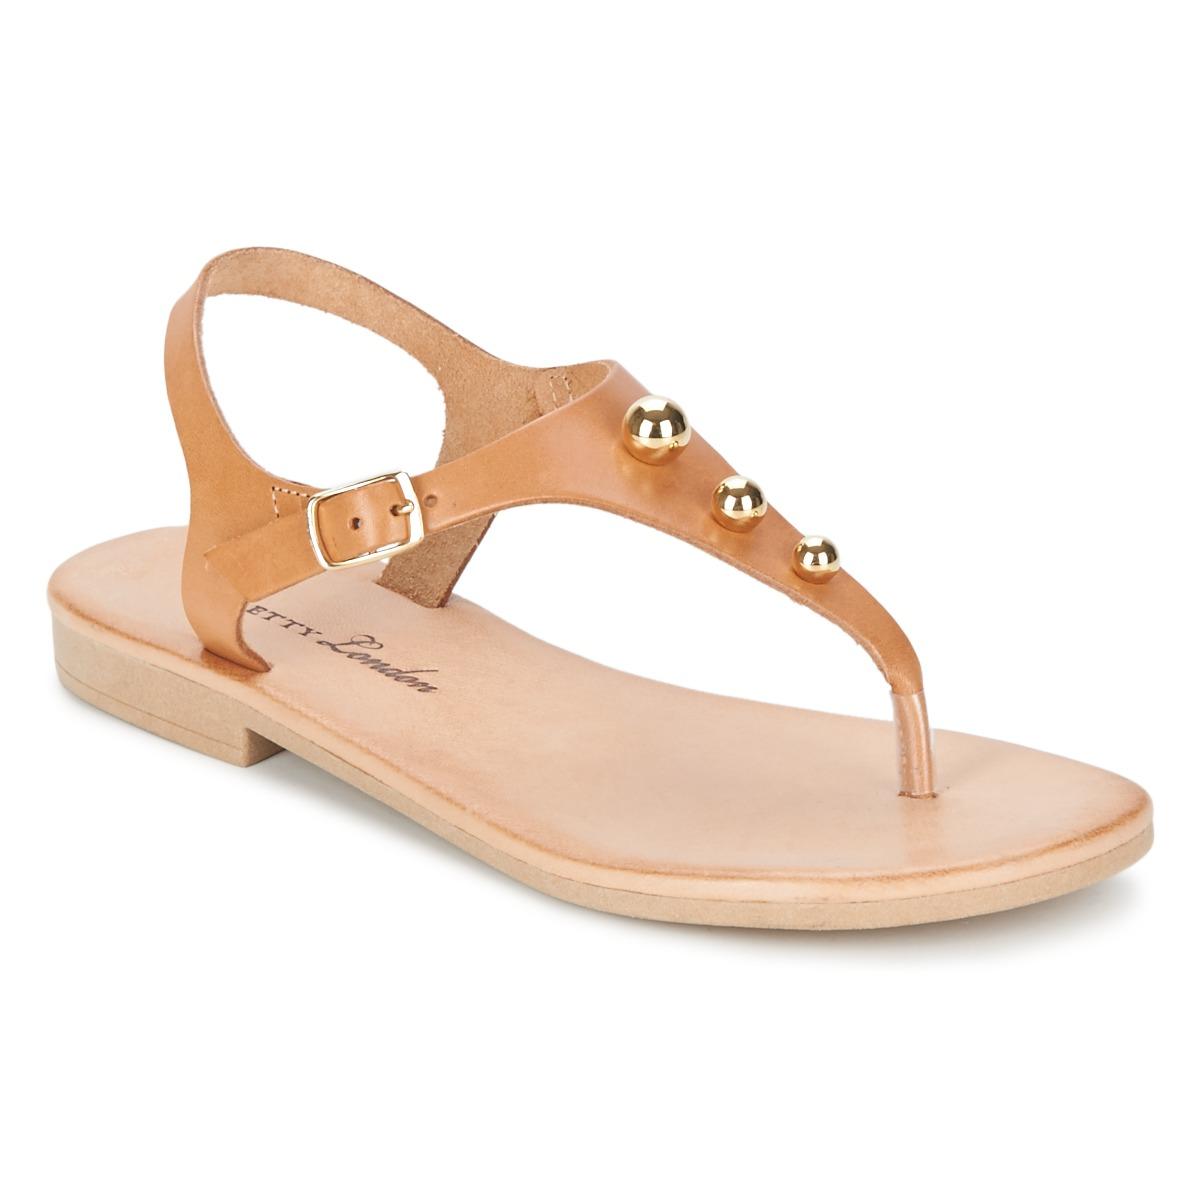 Sandals BT London VITALLA CAMEL